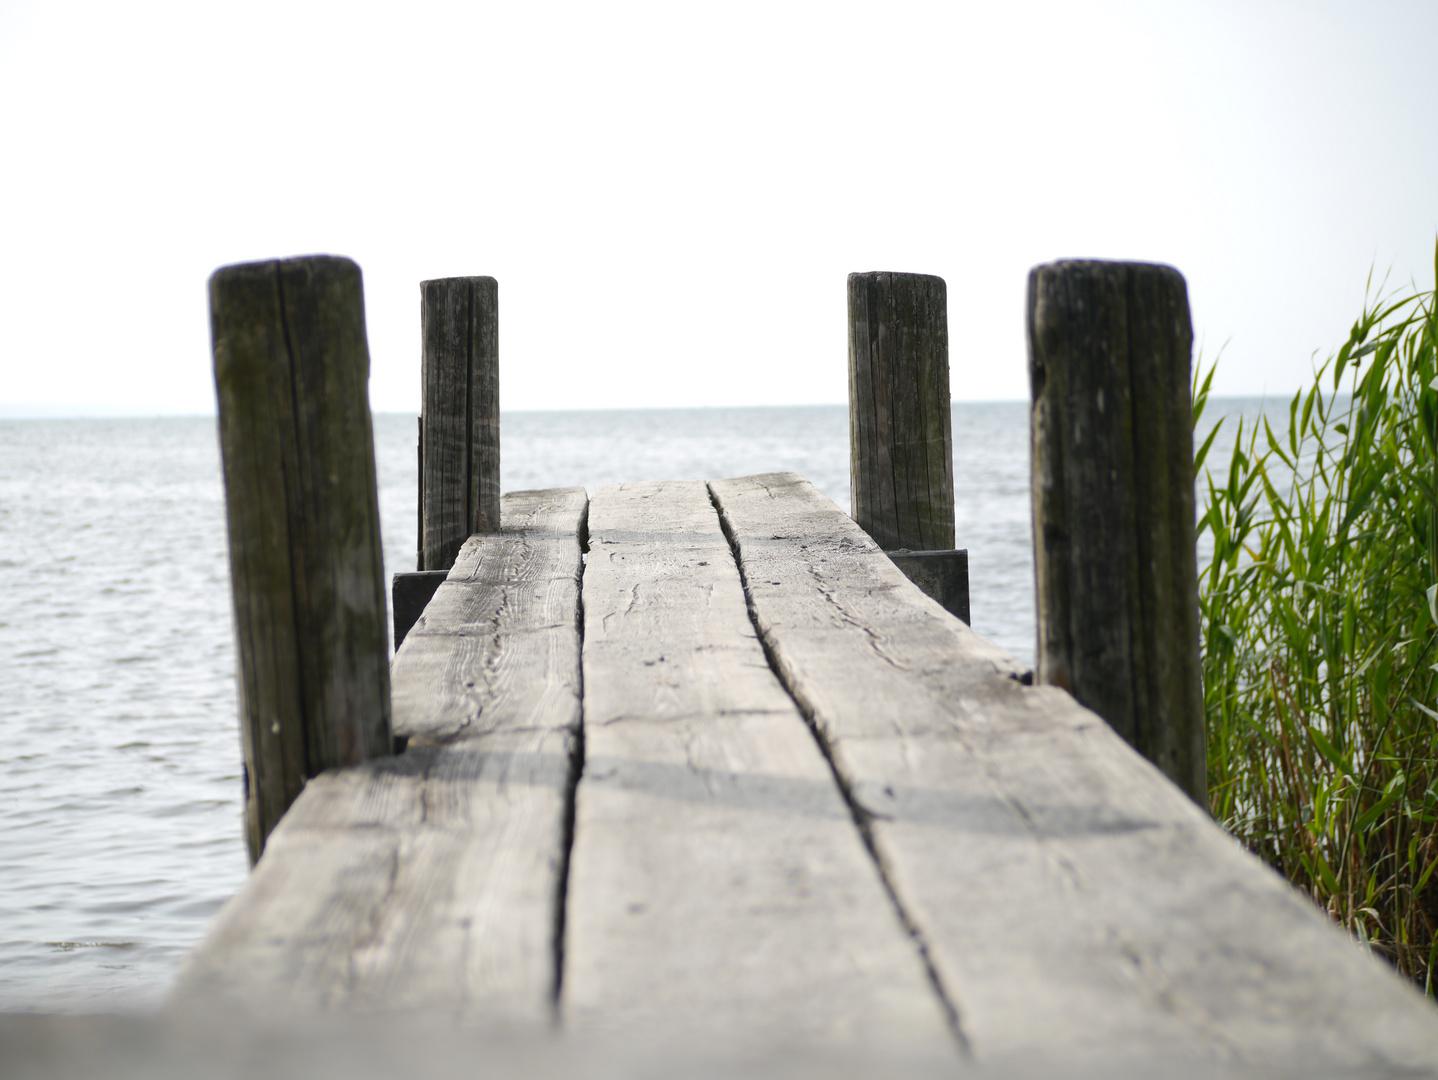 Steg im See